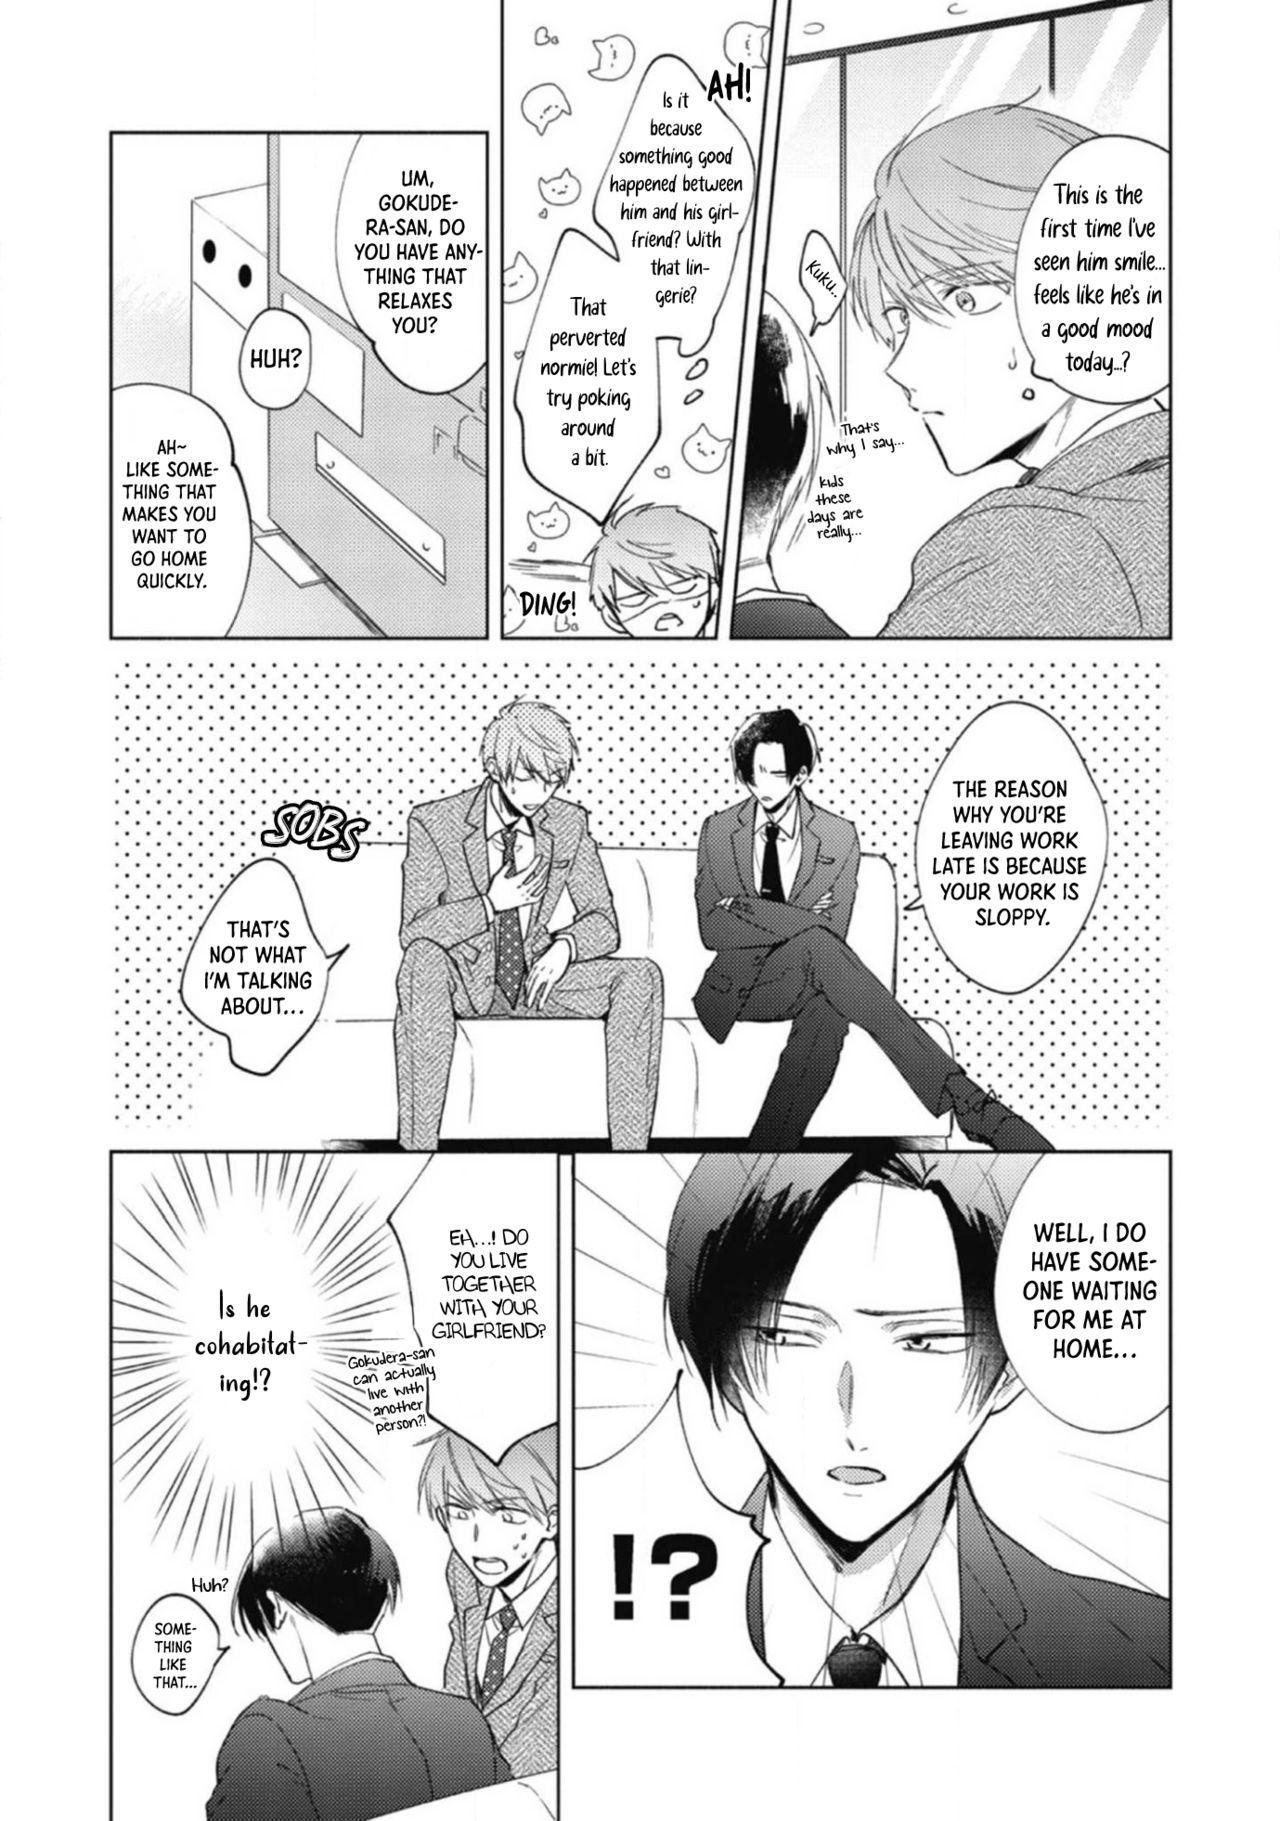 Oni Joushi Gokudera-san wa Abakaretai   My demon boss, Gokudera wants to be exposed 1 16